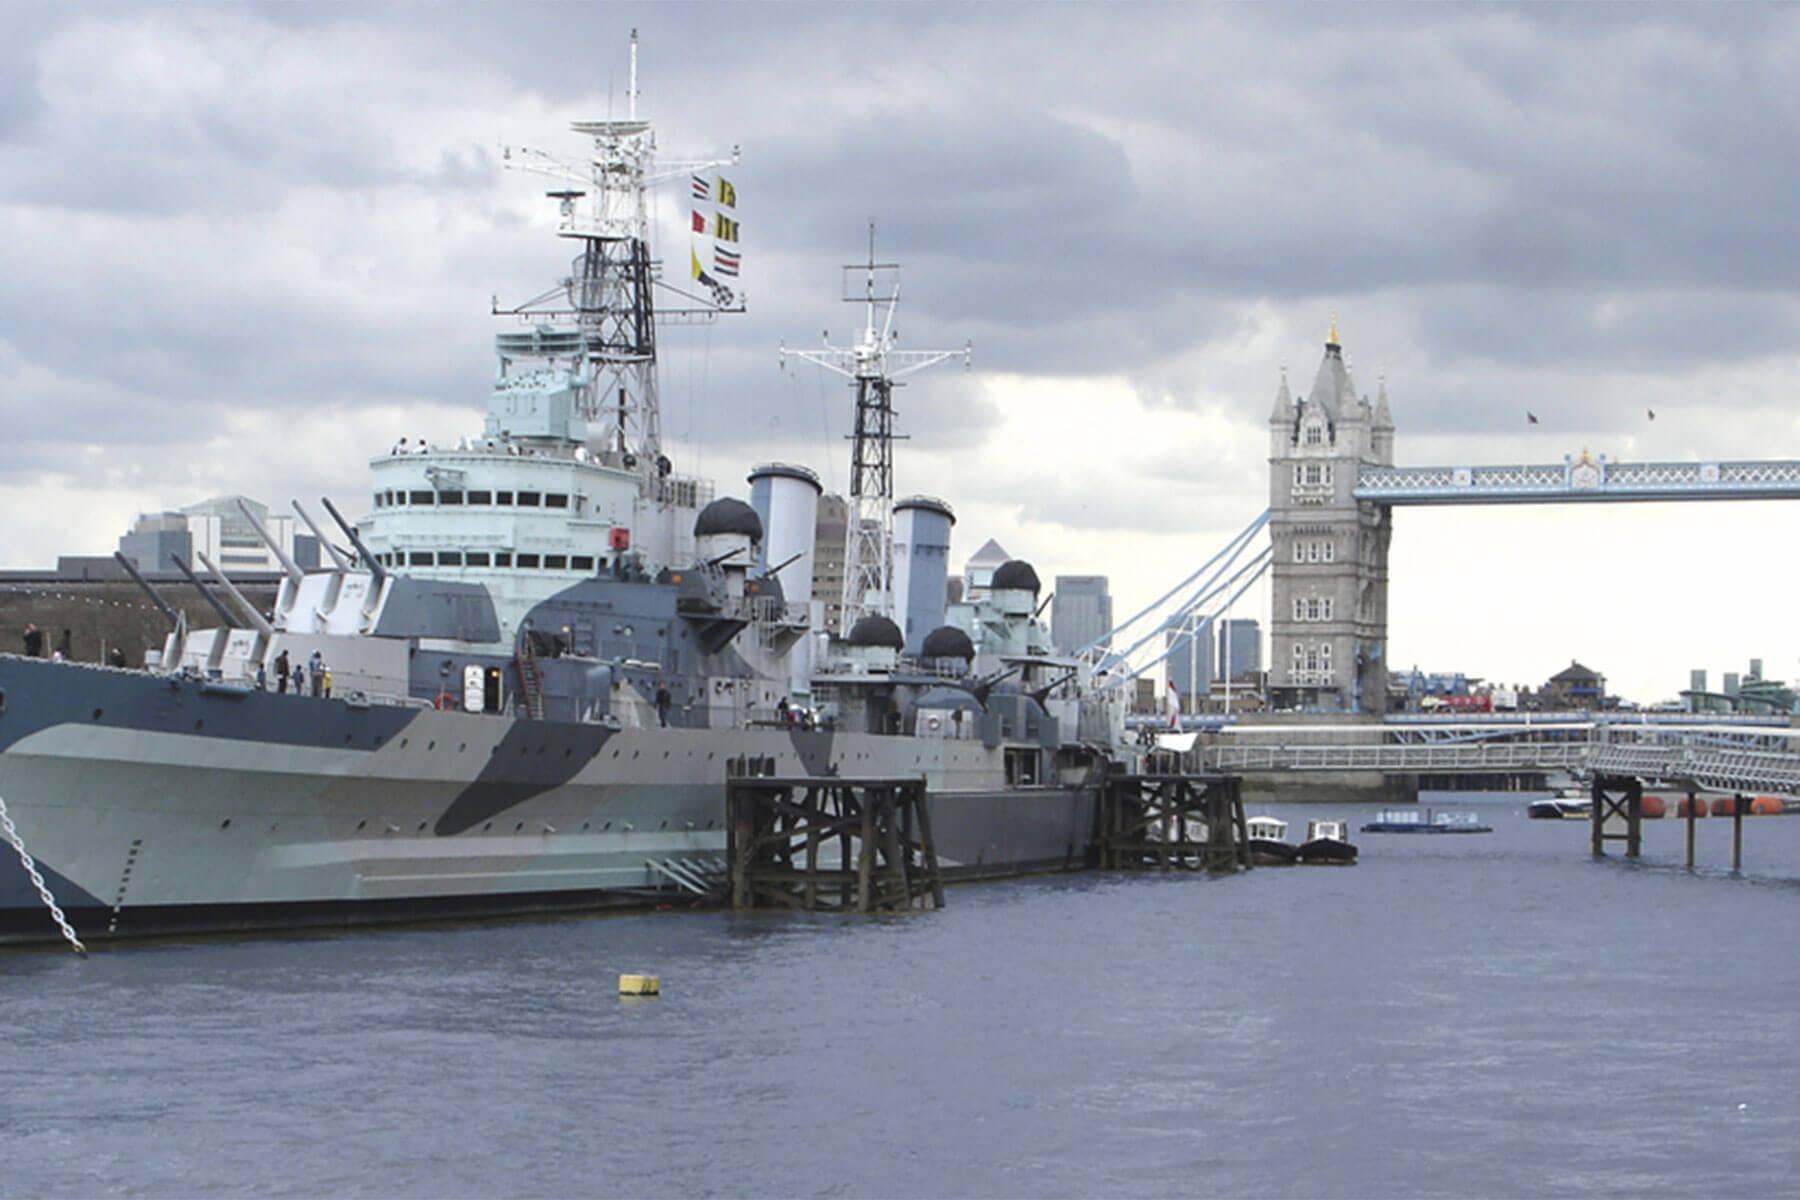 Thames River Service: E-COMMERCE SOLUTION